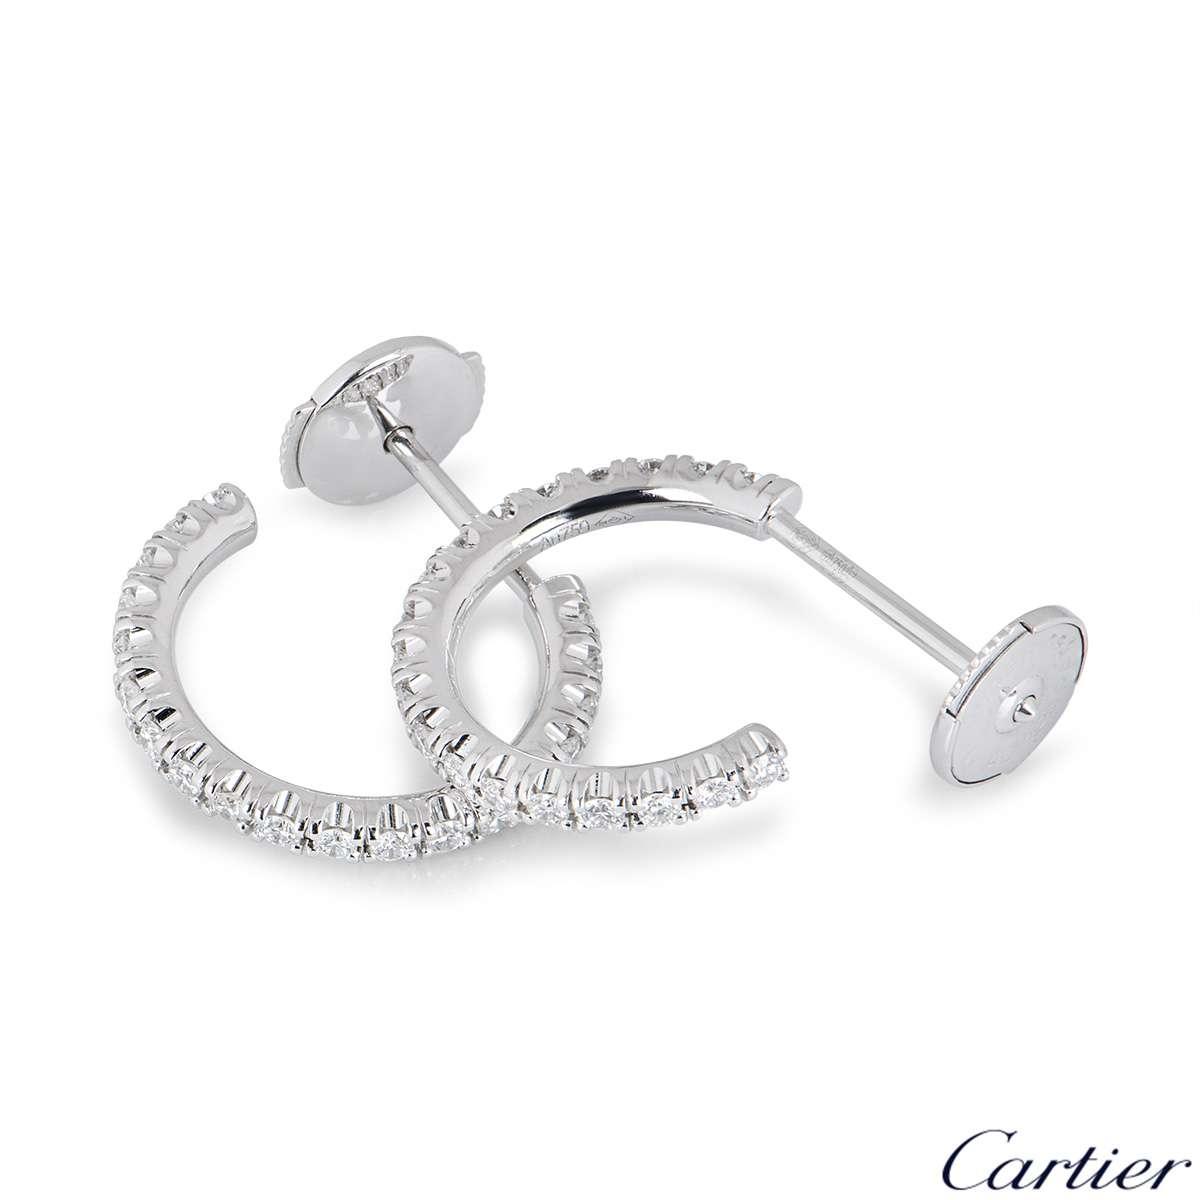 Cartier White Gold Etincelle Diamond Hoop Earrings B8301226